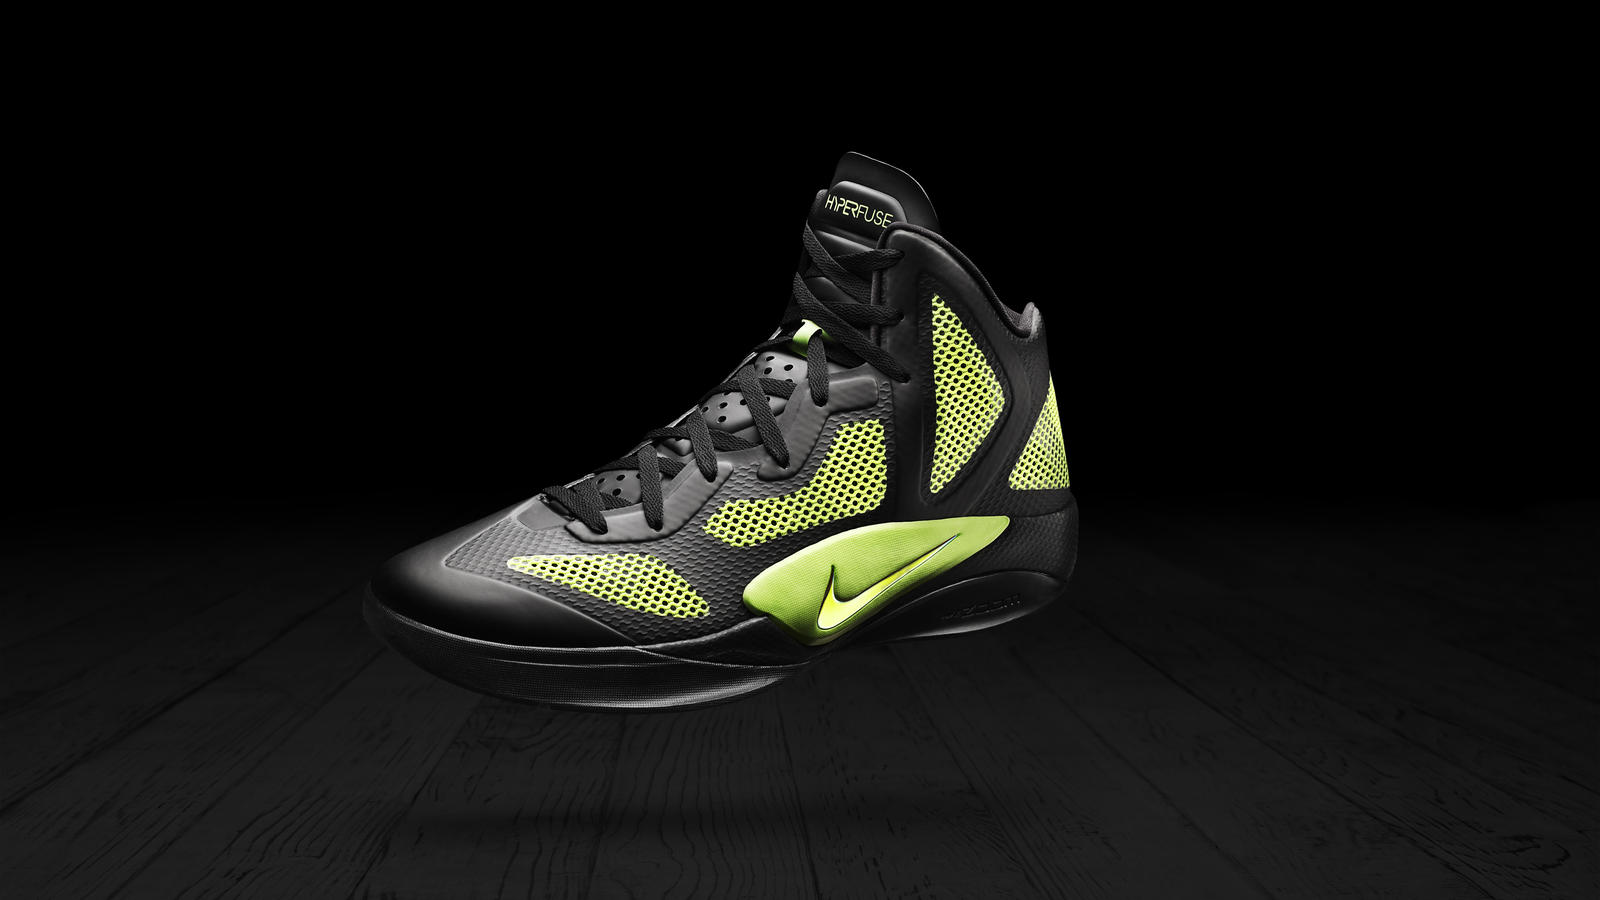 58ef8cf58b73 Nike Hyperfuse 2011 Hero2. Nike Hyperdunk 2011 Hero2.  Nike Hyperfuse 2011 Hero2. Nike Hyperdunk 2011 Hero2.  Nike Hyperfuse 2011 Hero2